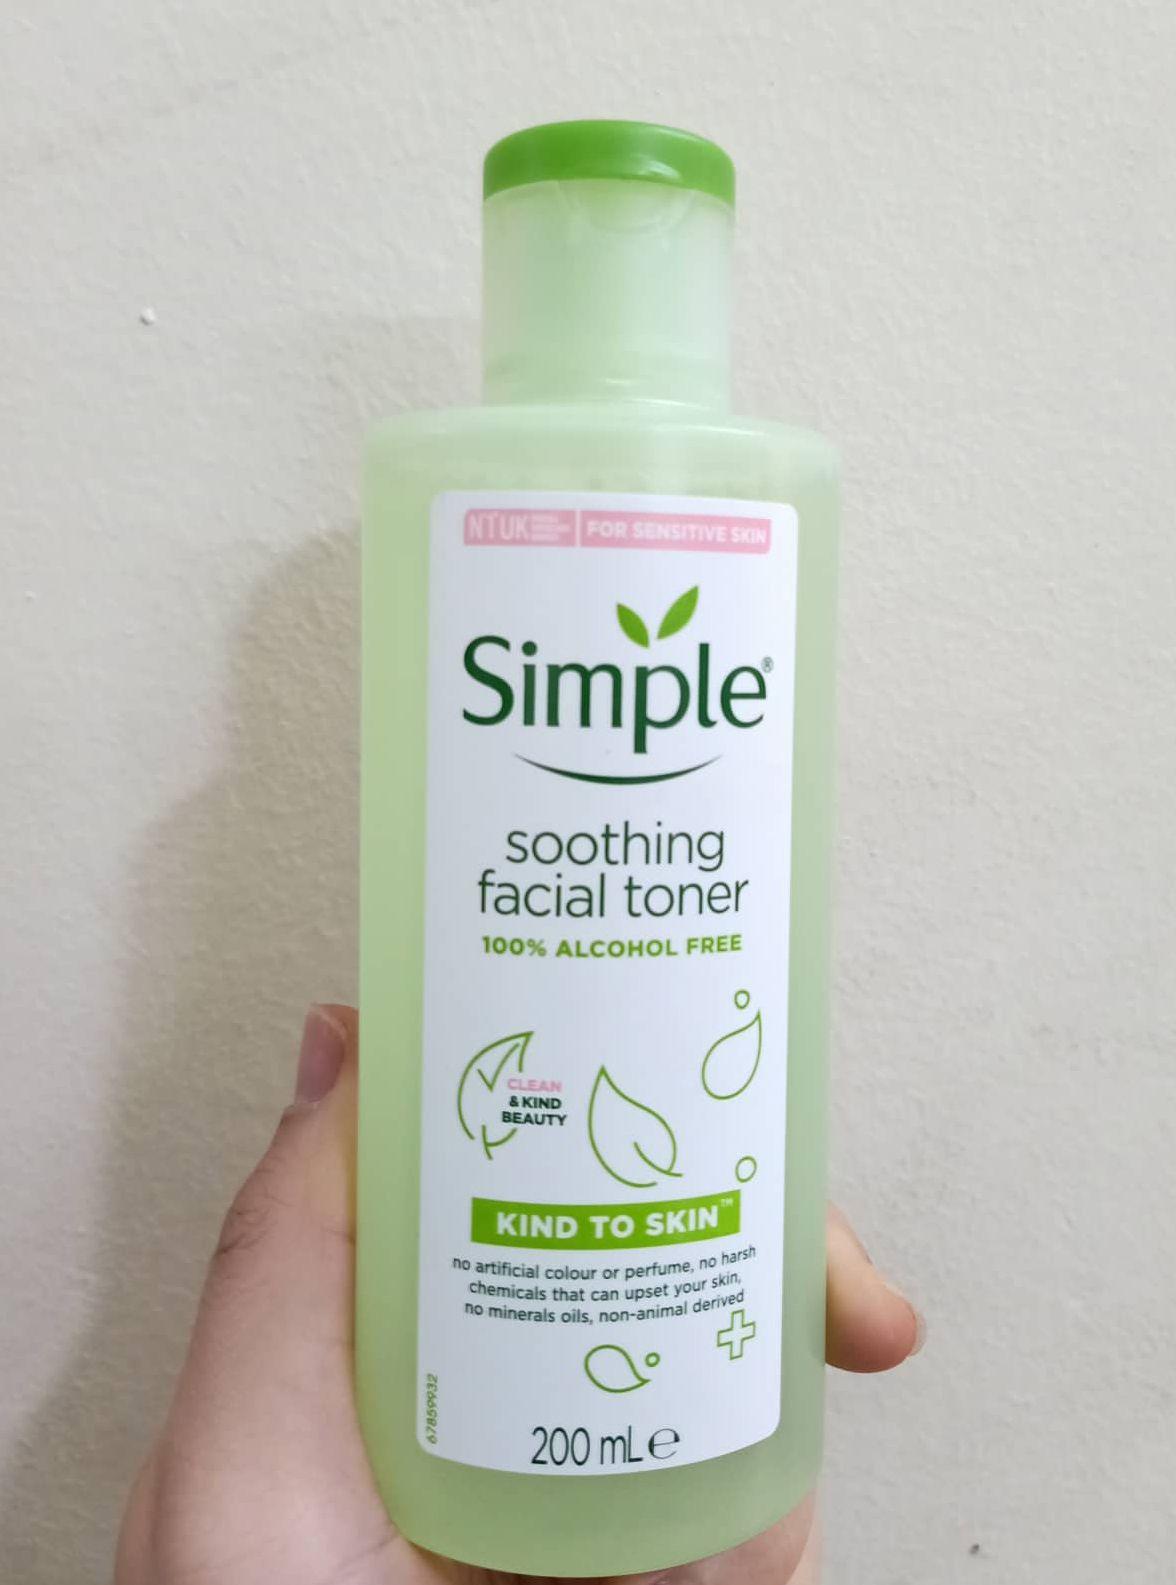 Nước hoa hồng Simple Soothing Facial Toner mẫu mới